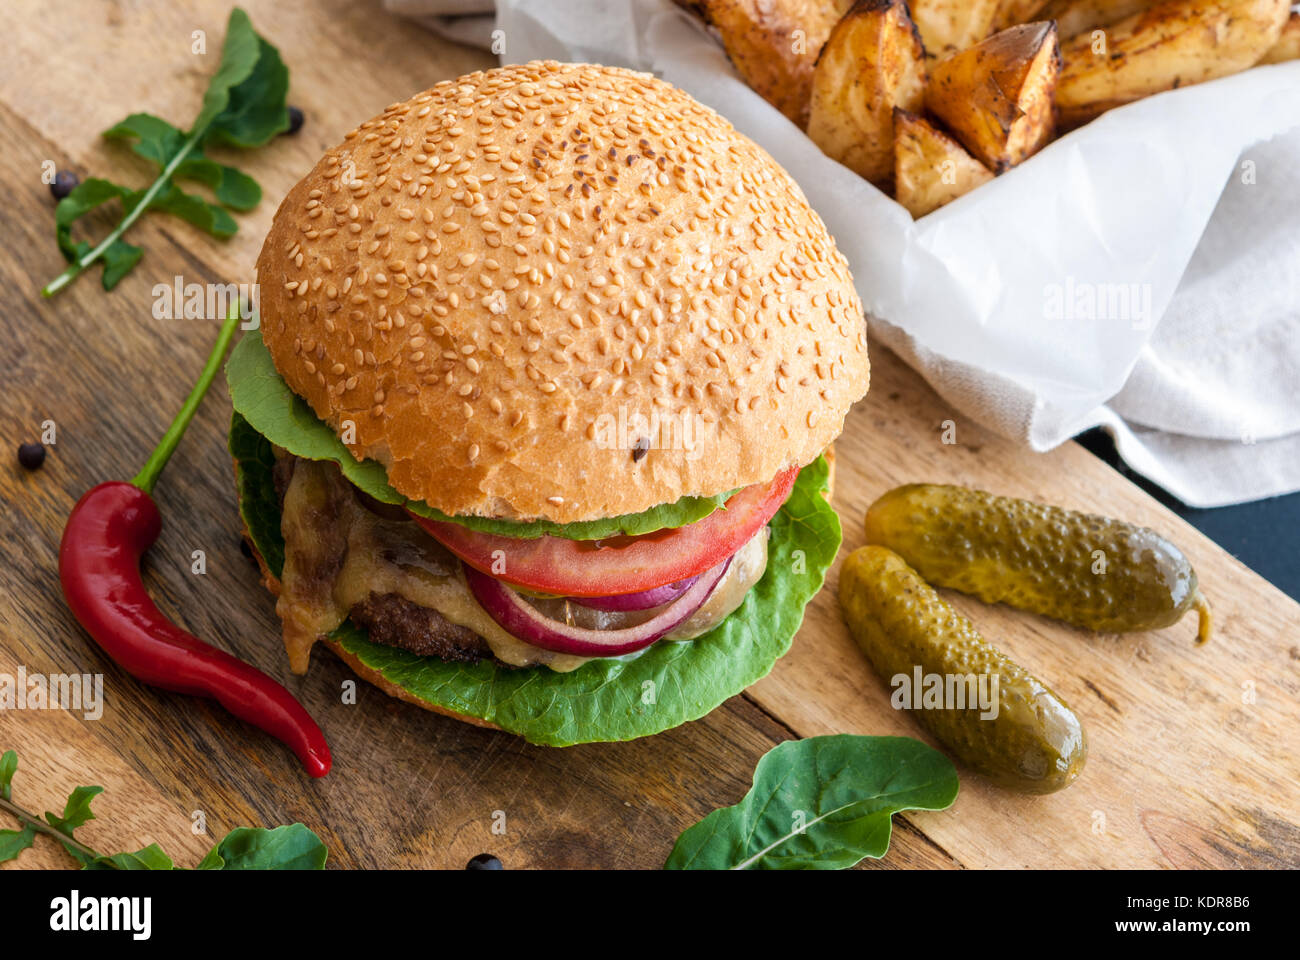 Tasty burger ready to eat - Stock Image